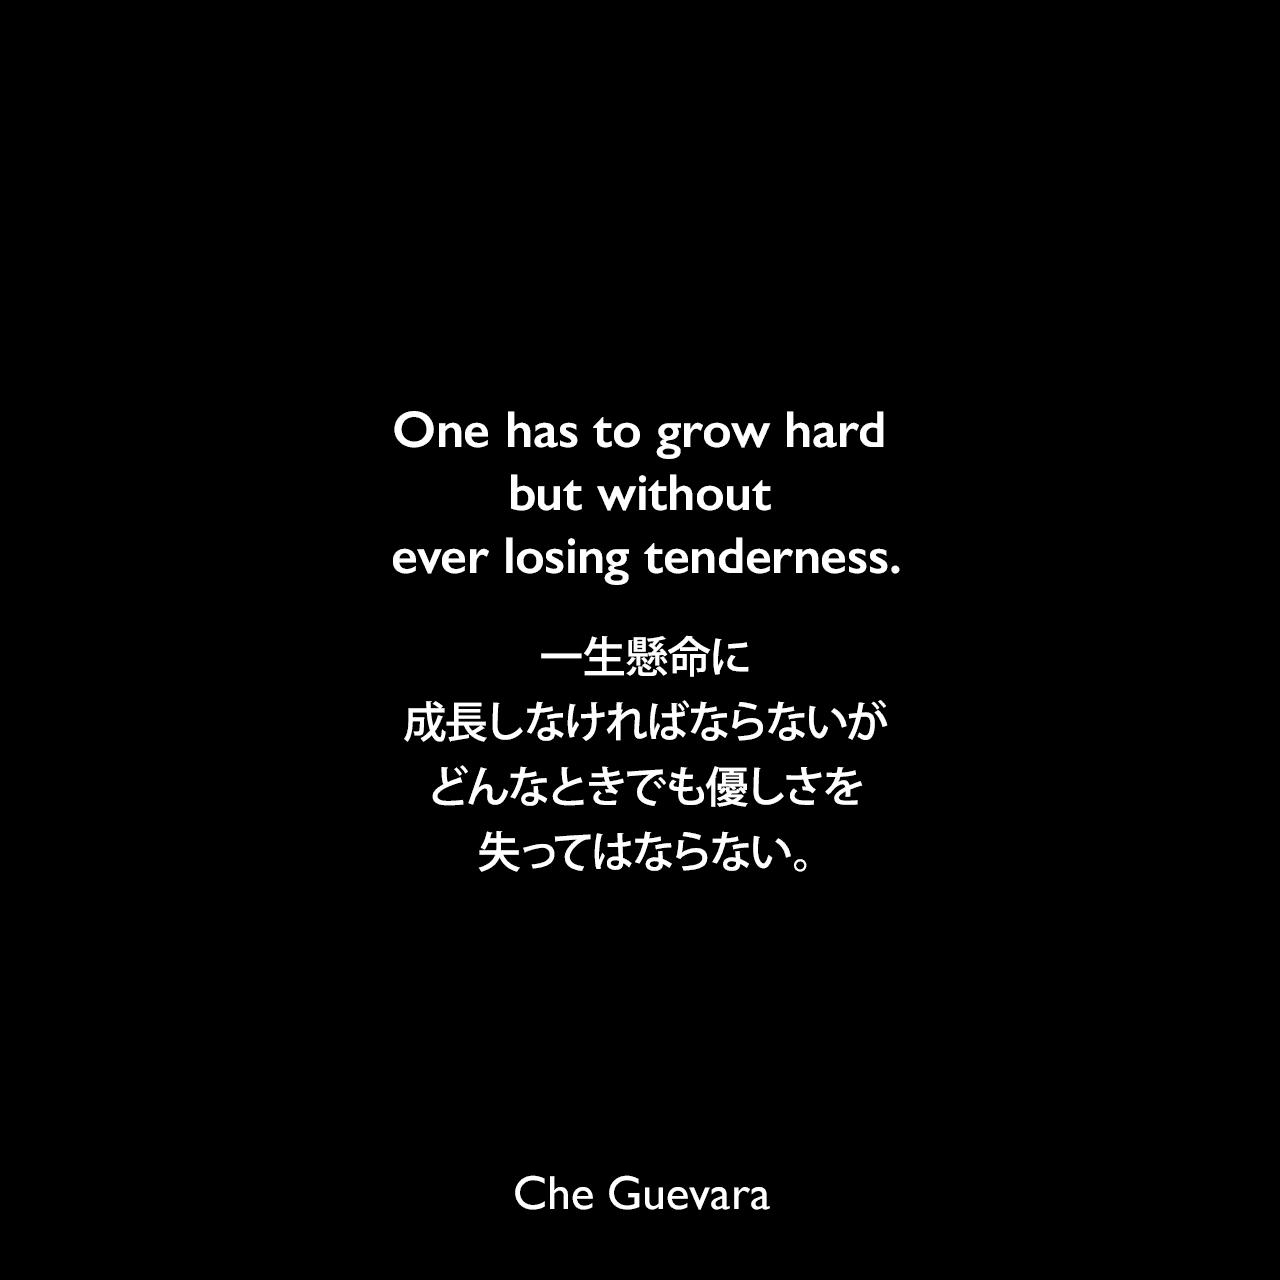 One has to grow hard but without ever losing tenderness.一生懸命に成長しなければならないが、どんなときでも優しさを失ってはならない。- レオナルド・ボフによる本「Essential Care : An Ethics of Human Nature」よりChe Guevara